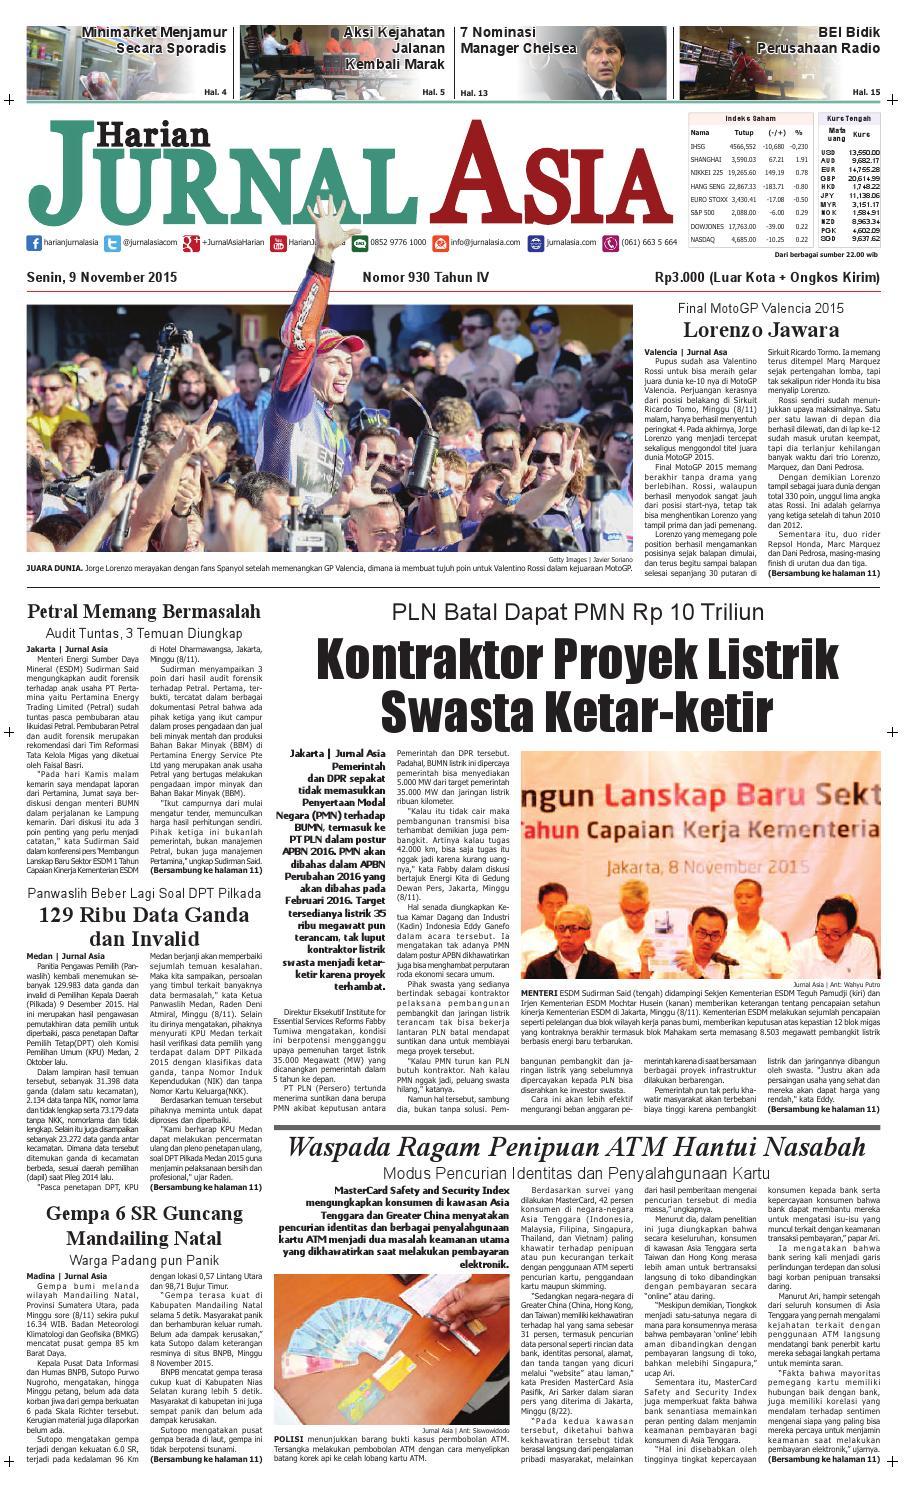 Harian Jurnal Asia Edisi Senin 09 November 2015 By Parcel Makanan Ampamp Keramik Pja 1608 Medan Issuu